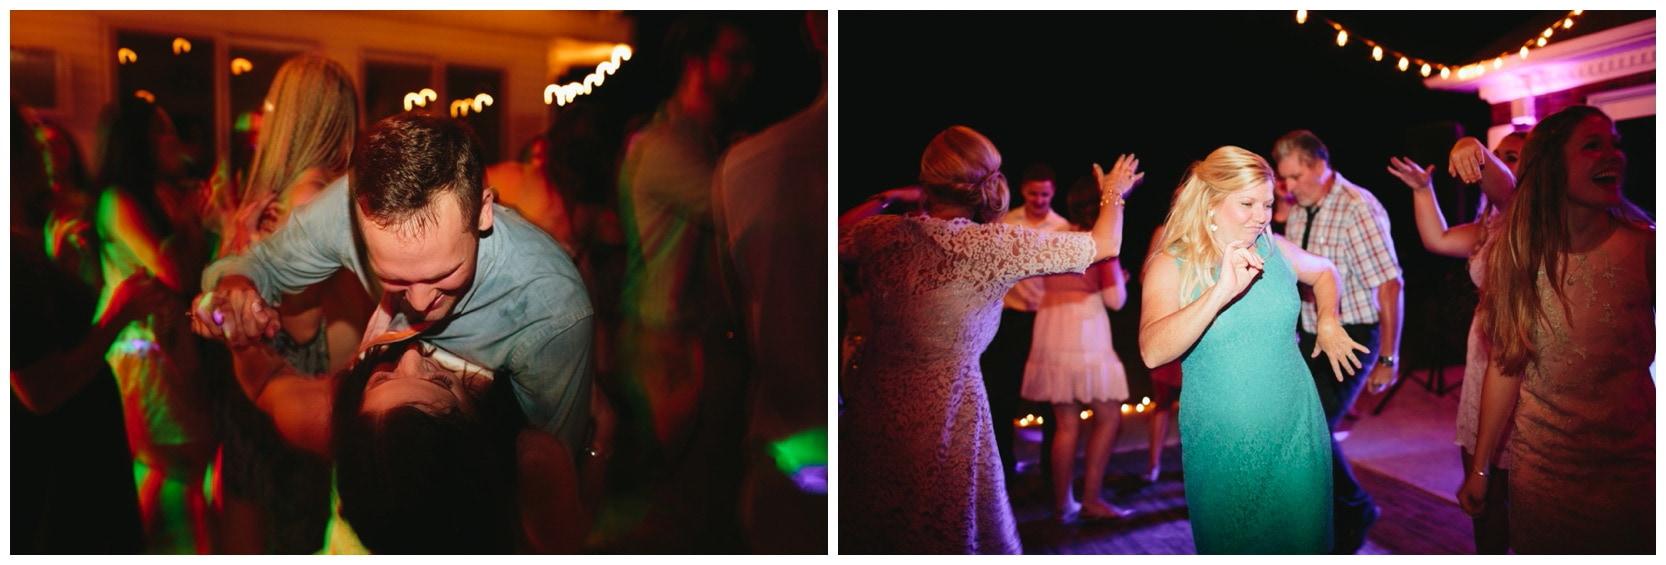 sauserkirby_wedding__245